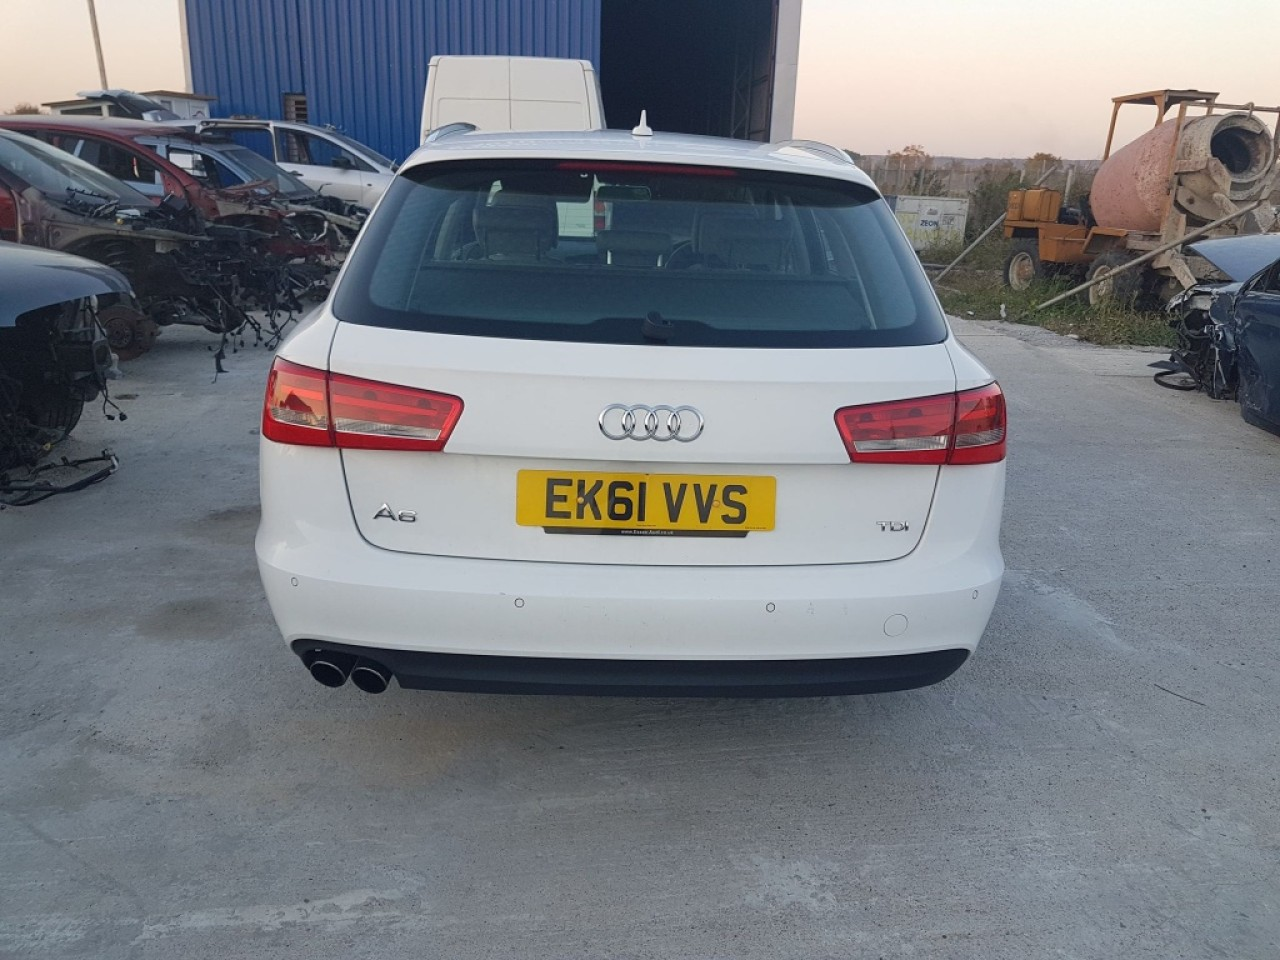 Fuzeta stanga fata Audi A6 4G C7 2012 variant 2.0 tdi